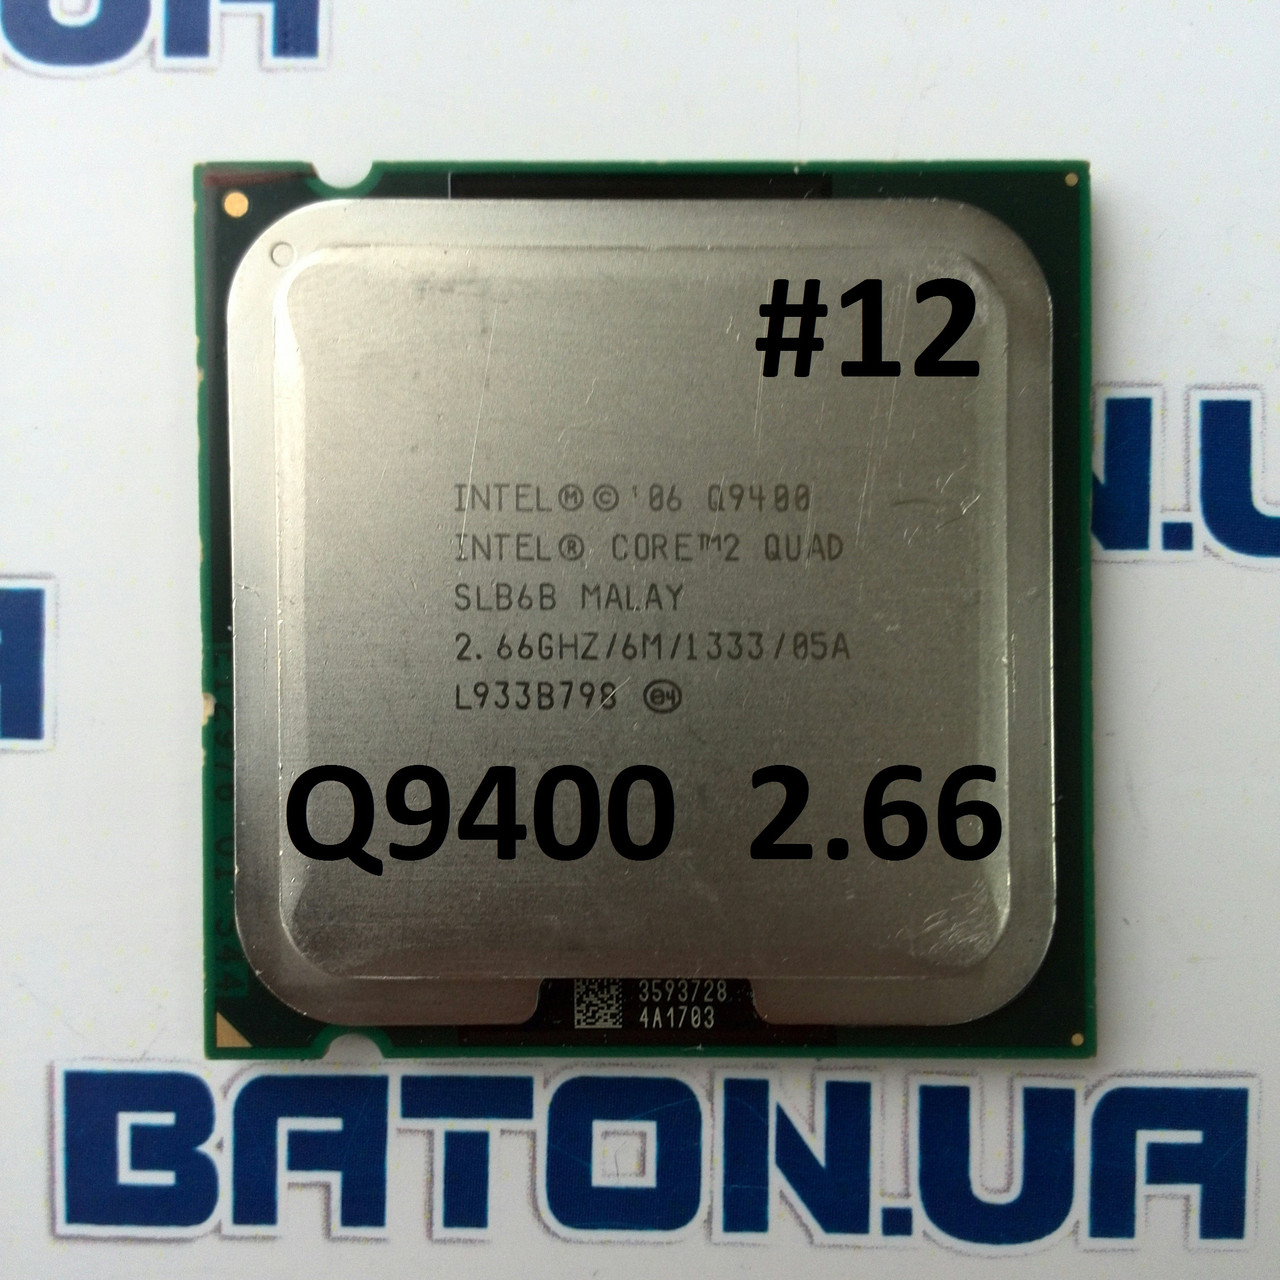 Процессор  ЛОТ #12 Intel® Core™2 Quad Q9400 2.66GHz 6M Cache 1333 MHz FSB Soket 775 Гарантия + Термопаста